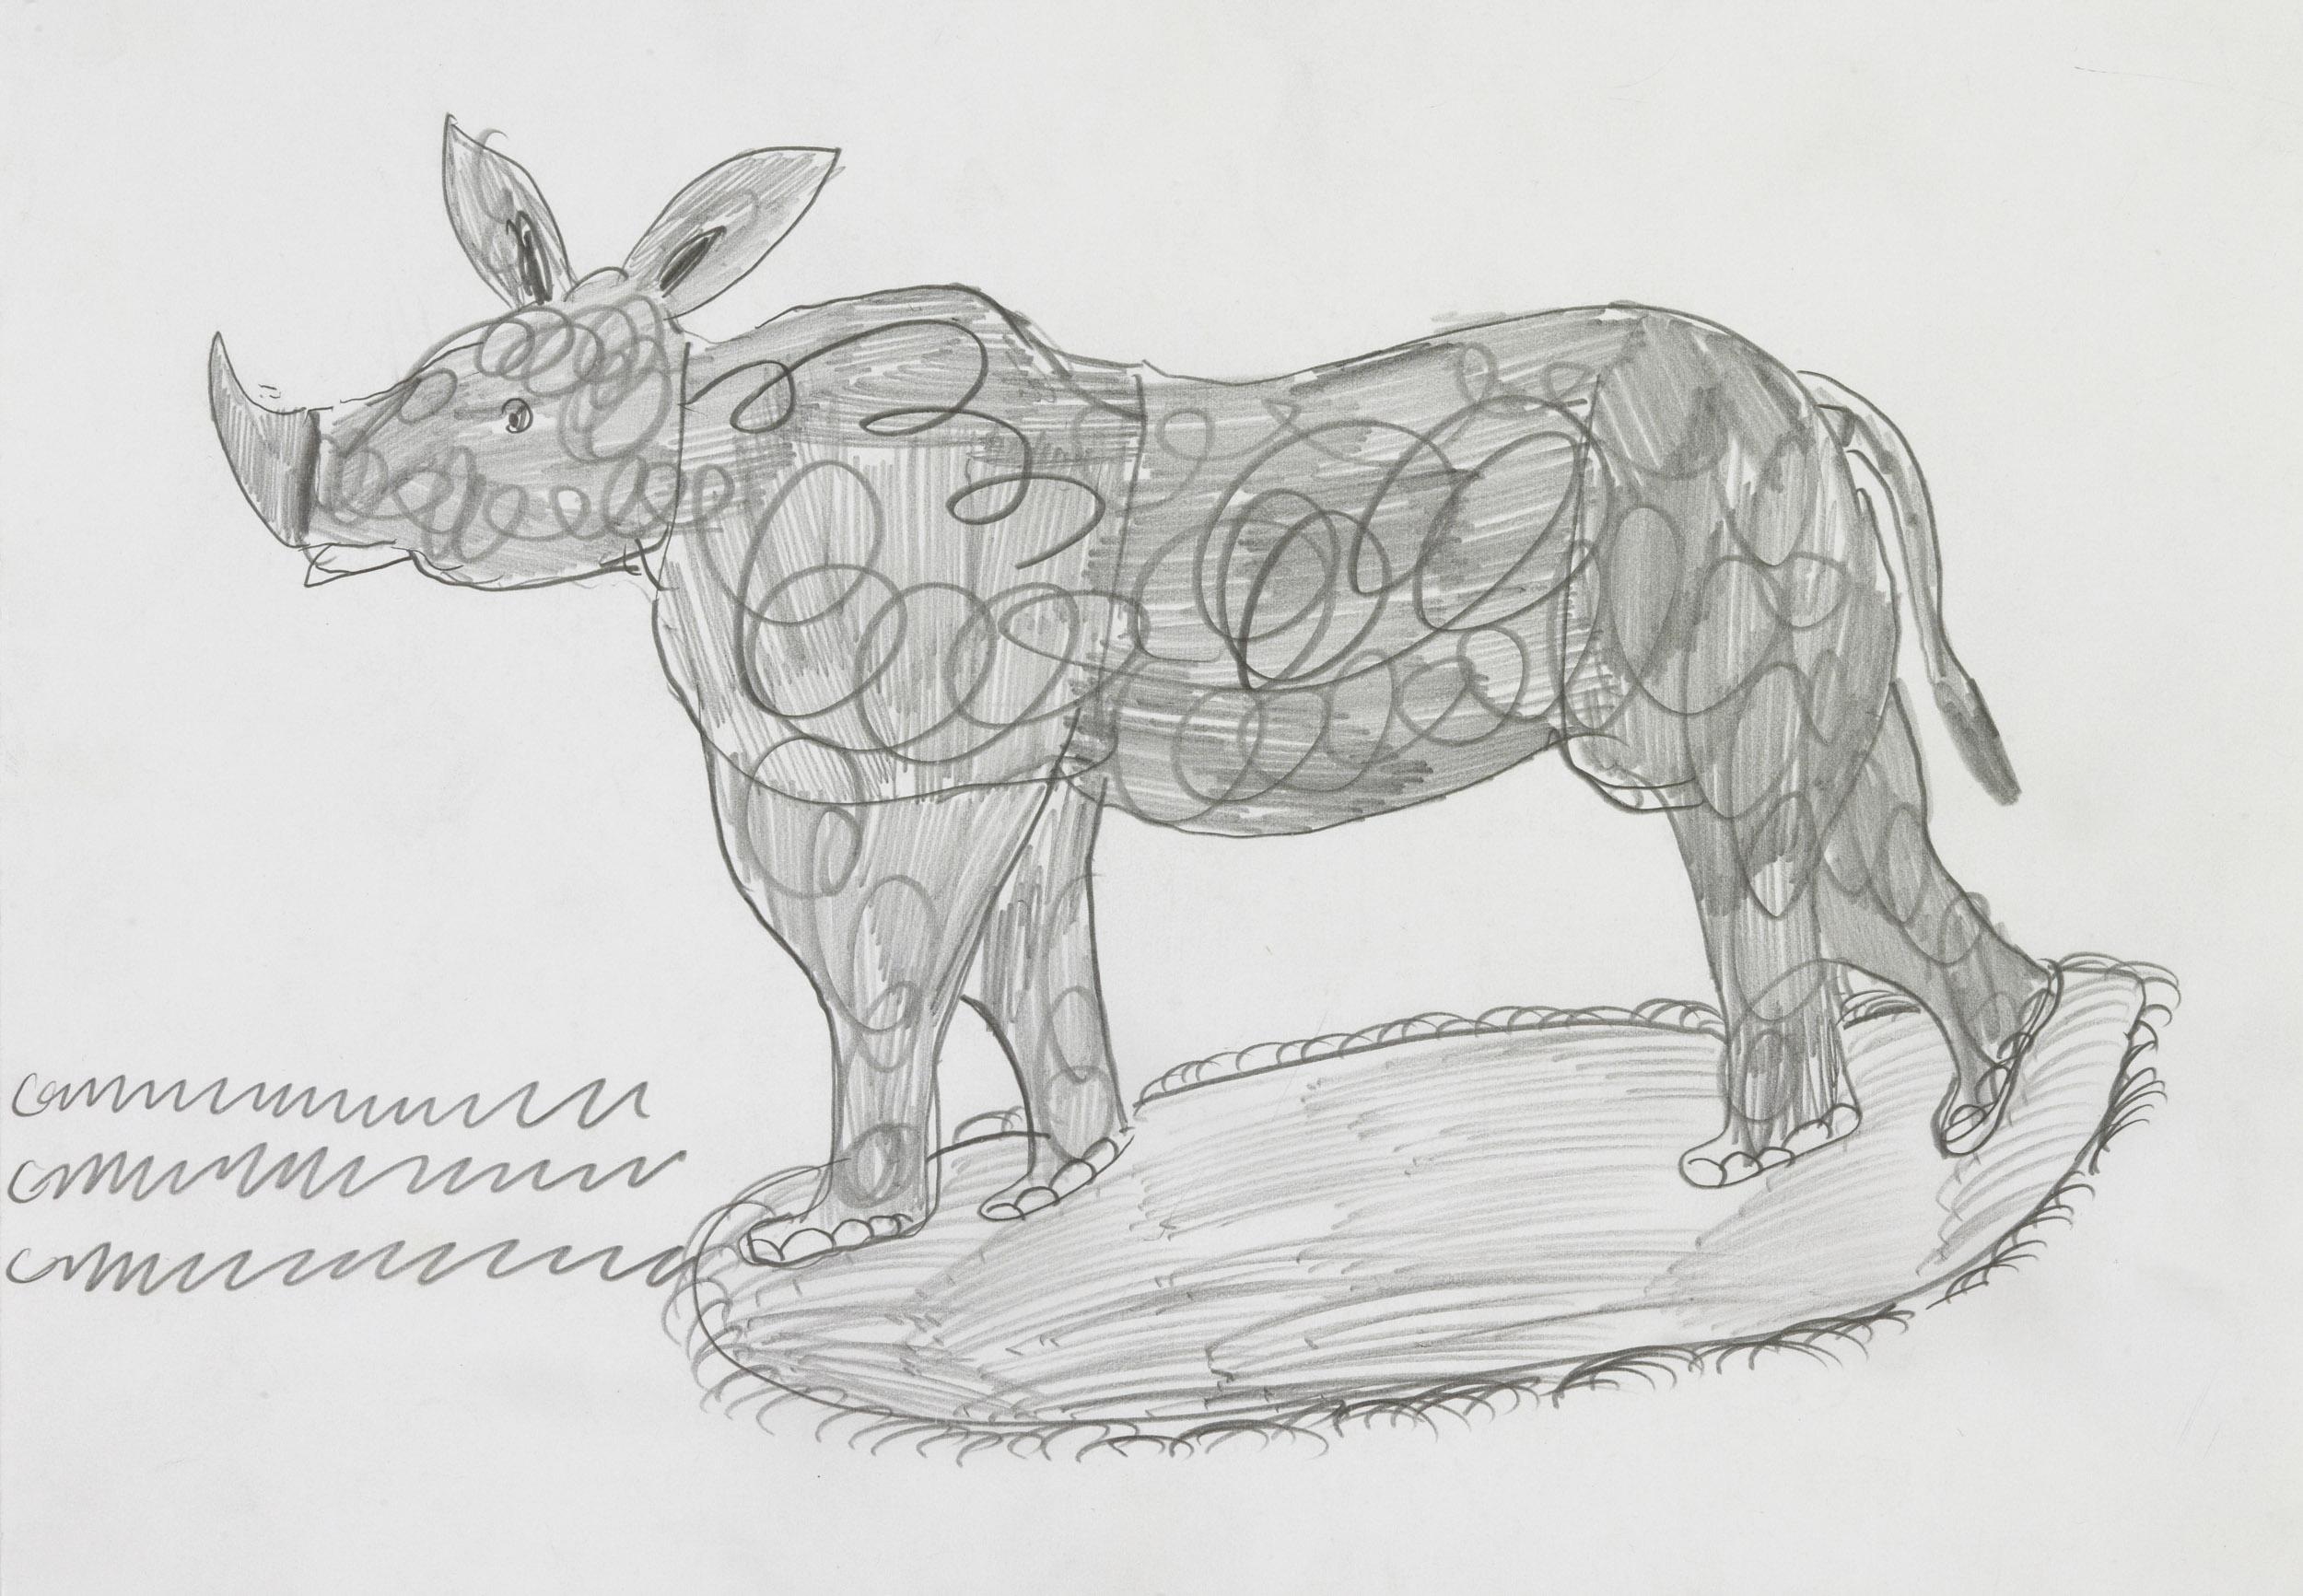 kamlander franz - nashorn / Rhinoceros